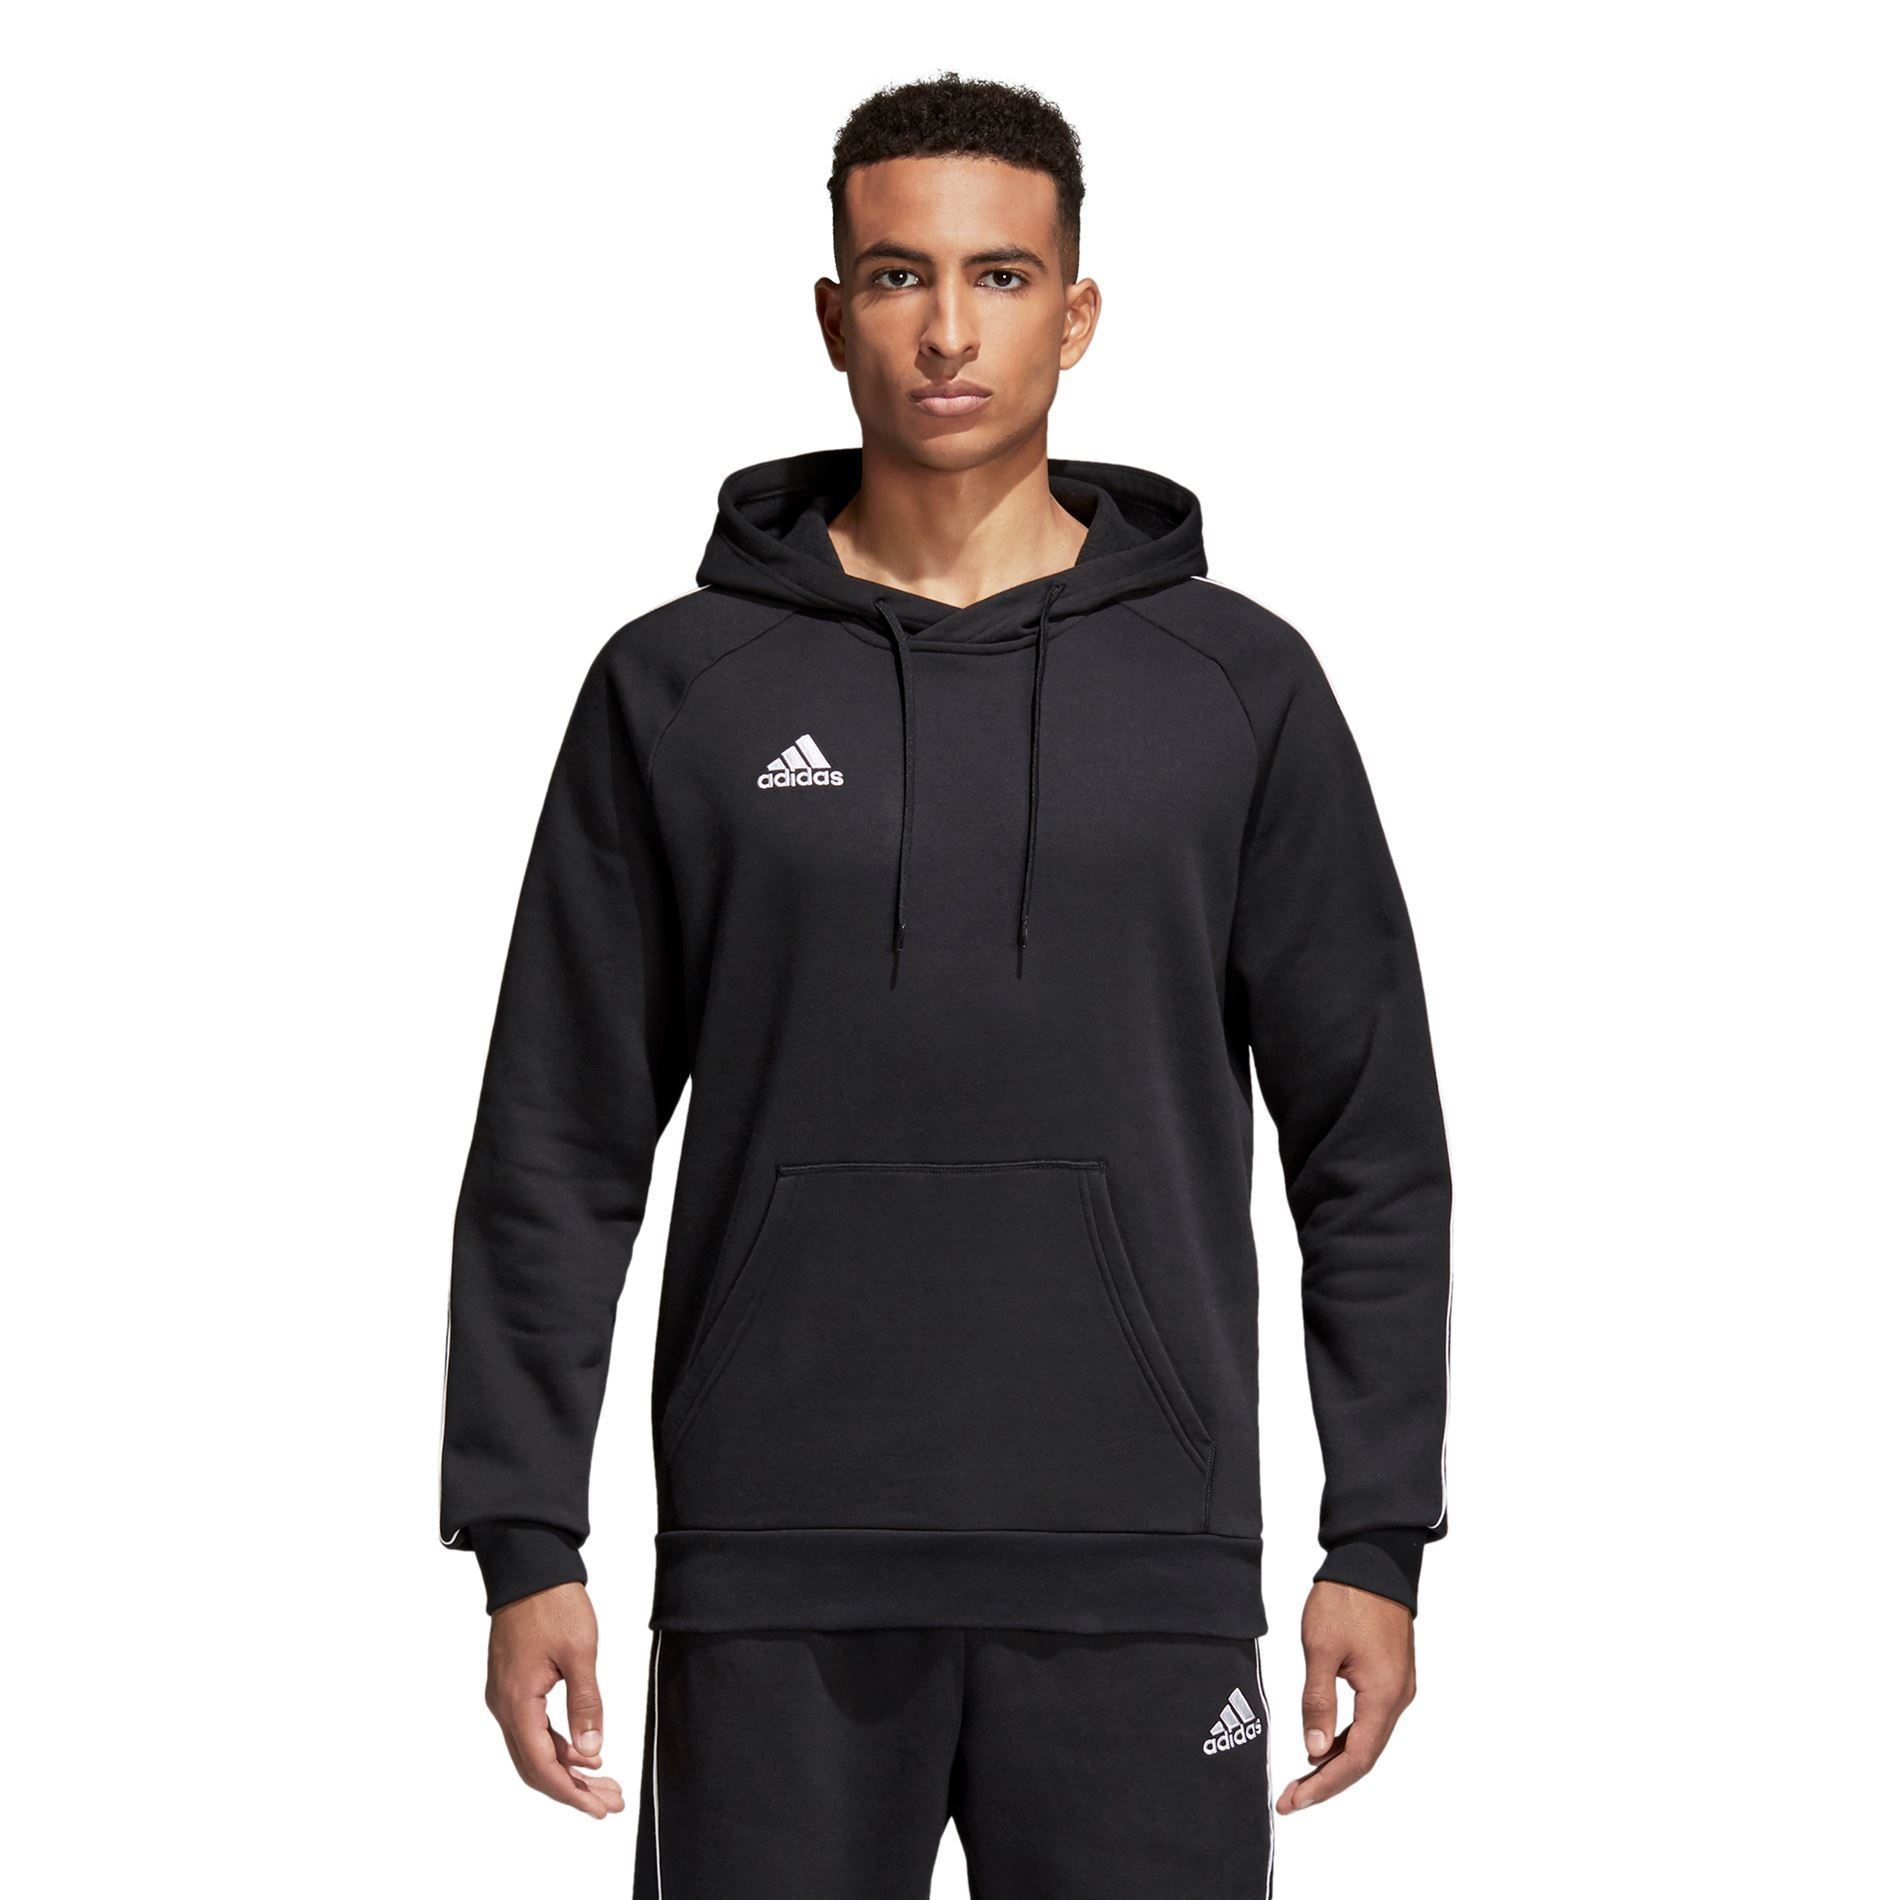 e43928ee Adidas Core 18 Hettegenser Utleira IL- Fotballsko.no - Sko fra Adidas, Nike  og Puma. Nor-Contact Sport